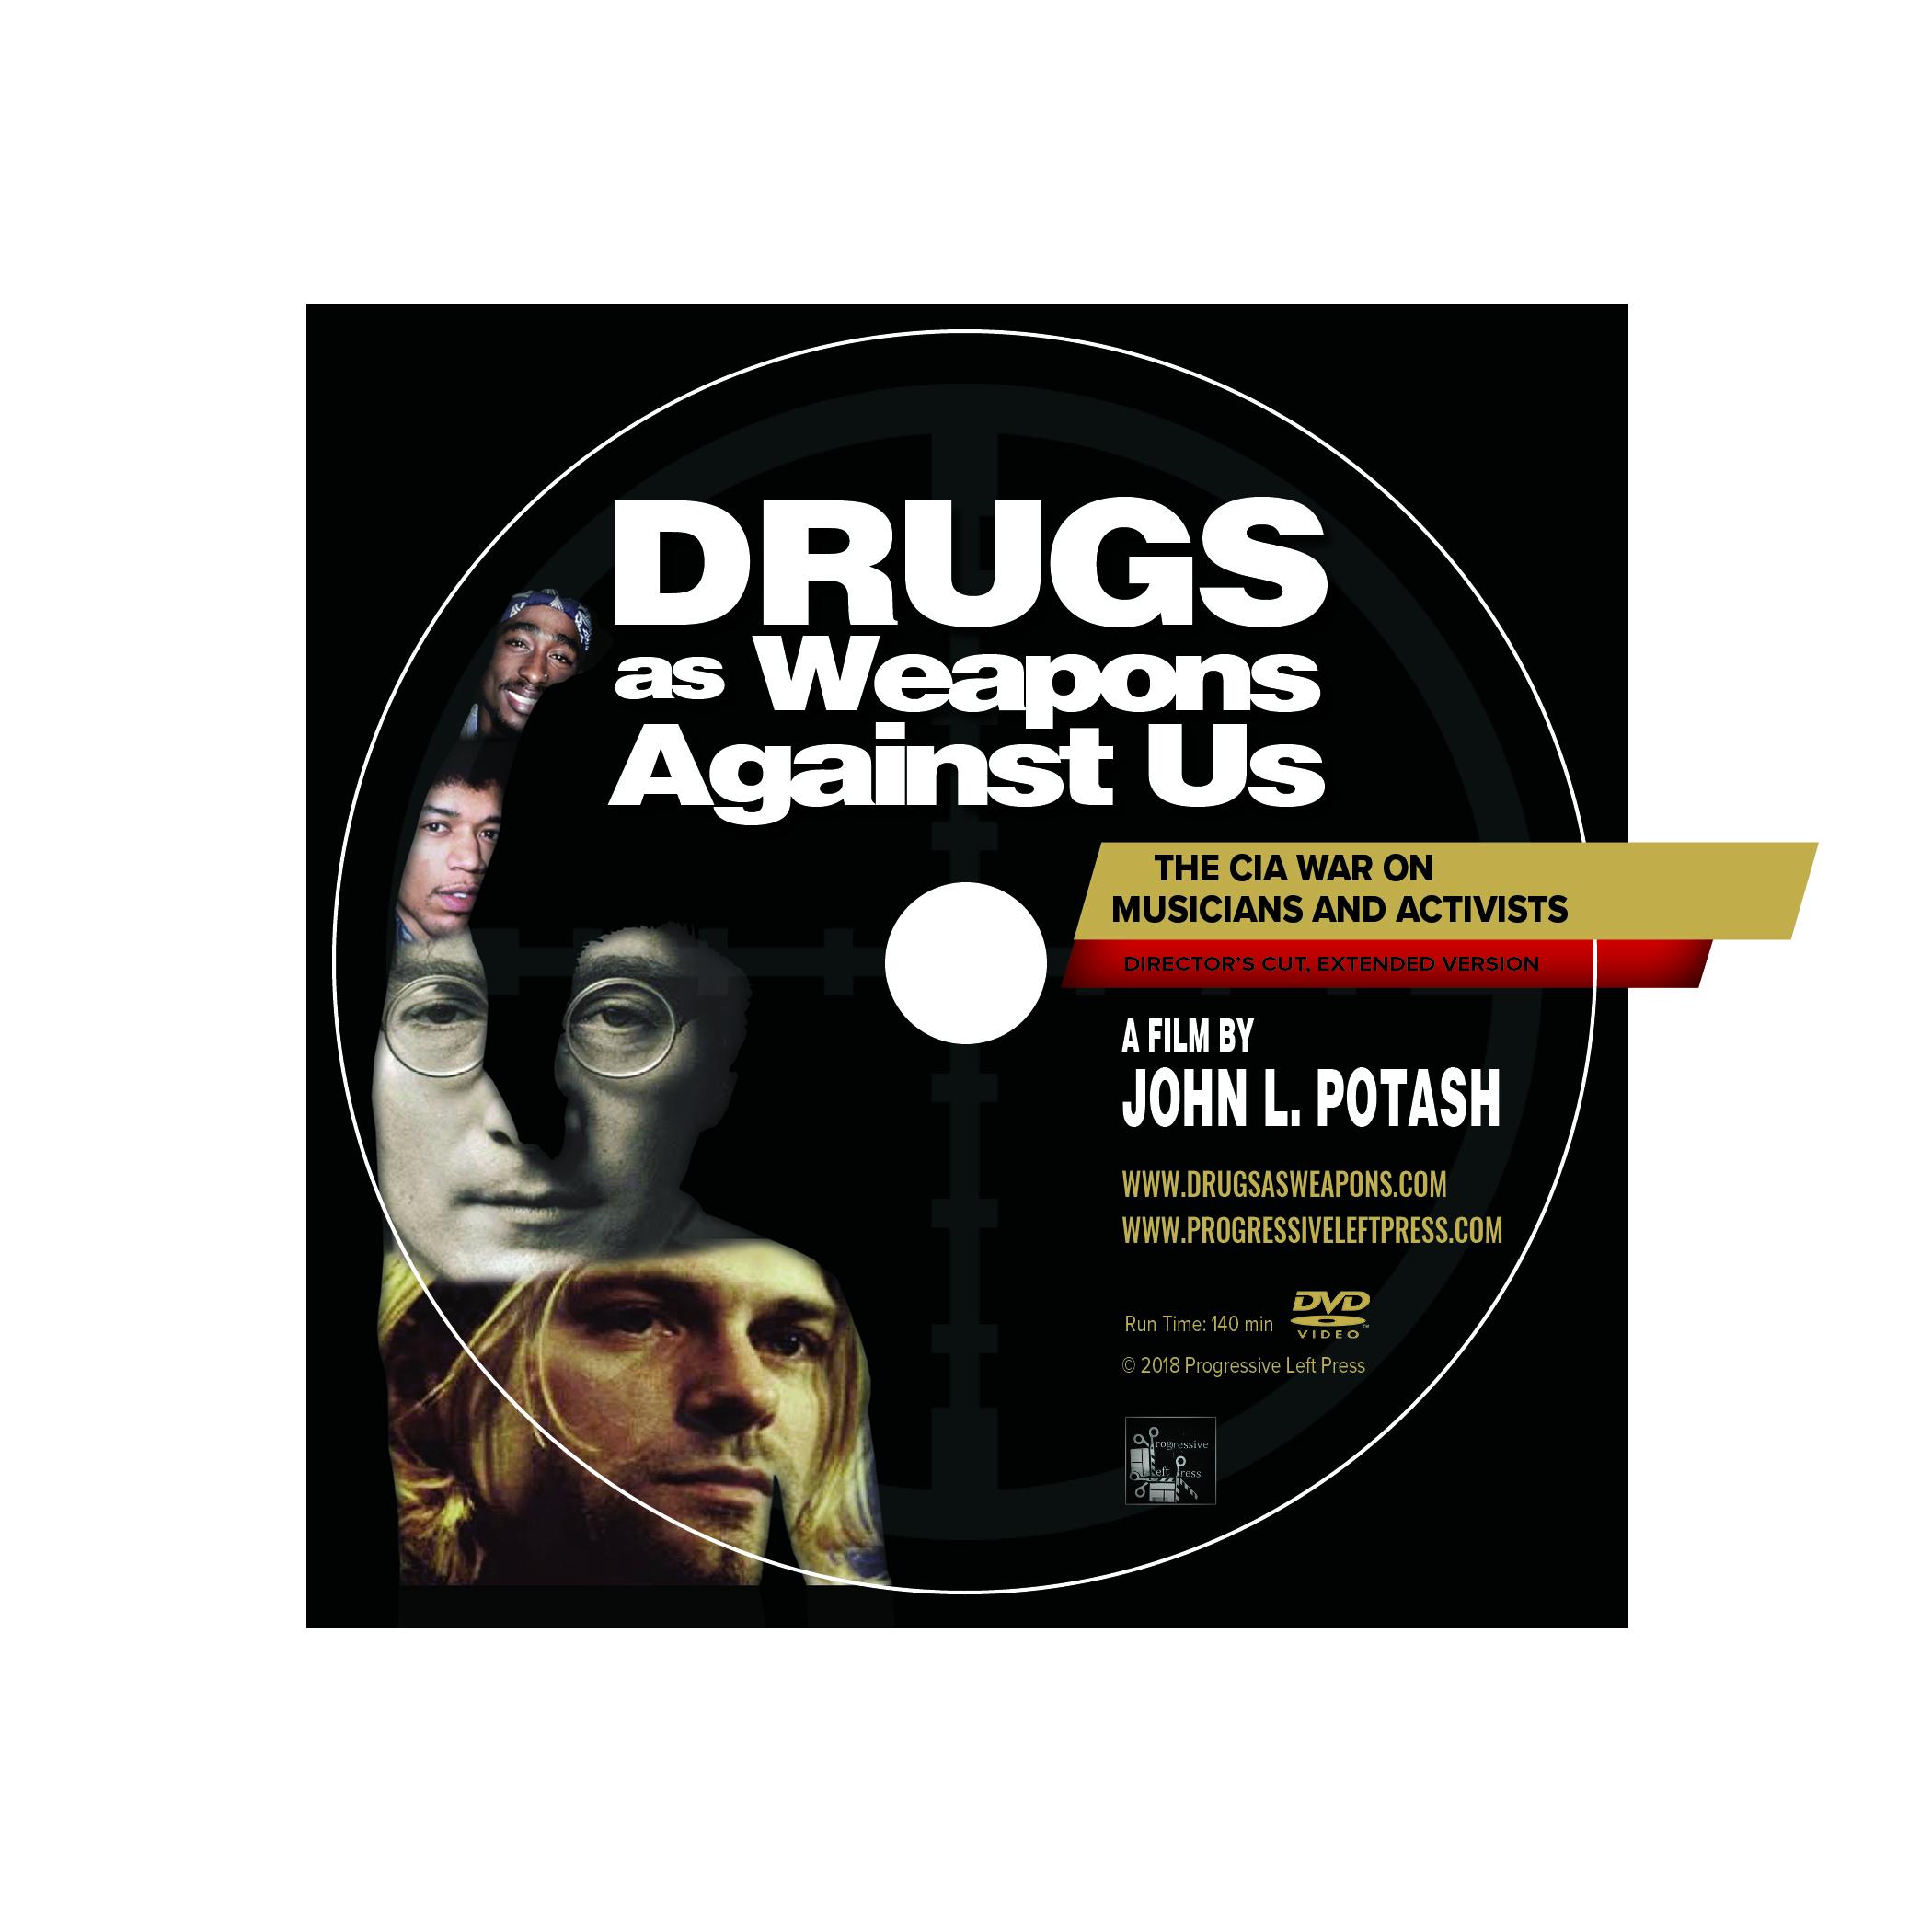 DrugsAsWeaponsDVDDirectorsCut-discartwcr